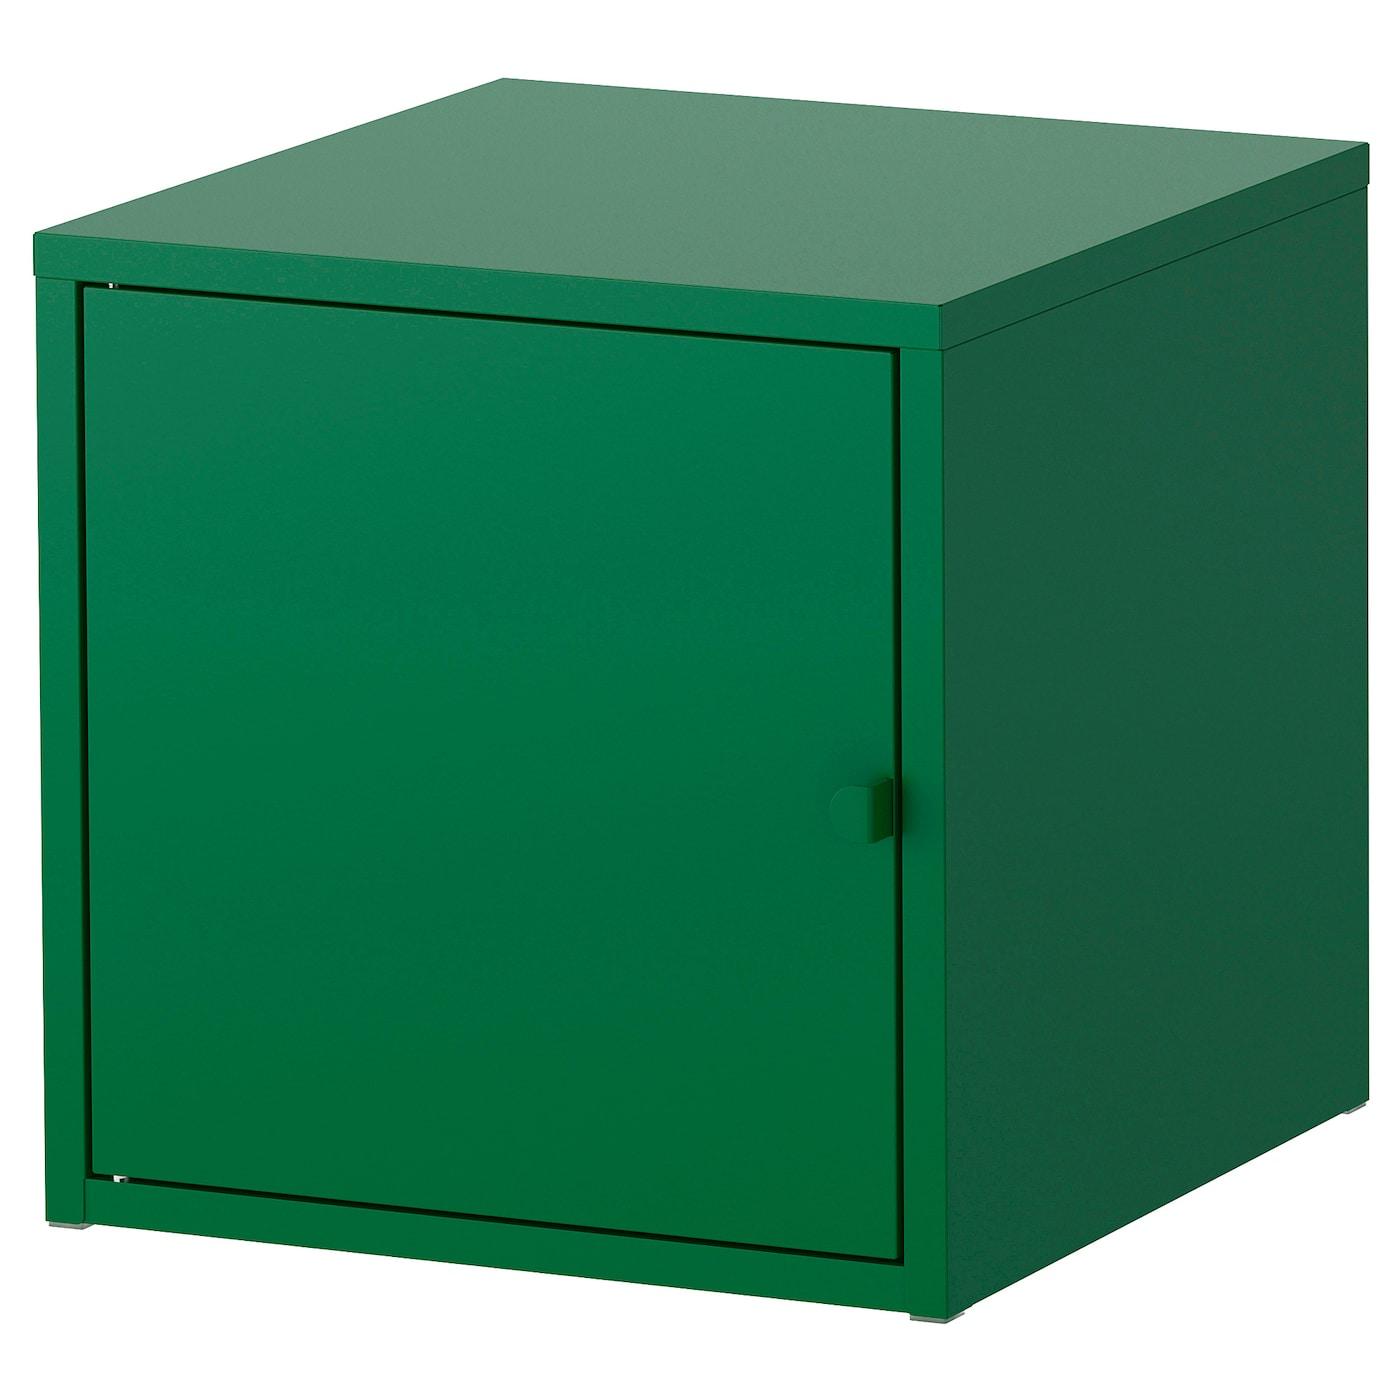 lixhult rangement m tal vert fonc 35x35 cm ikea. Black Bedroom Furniture Sets. Home Design Ideas